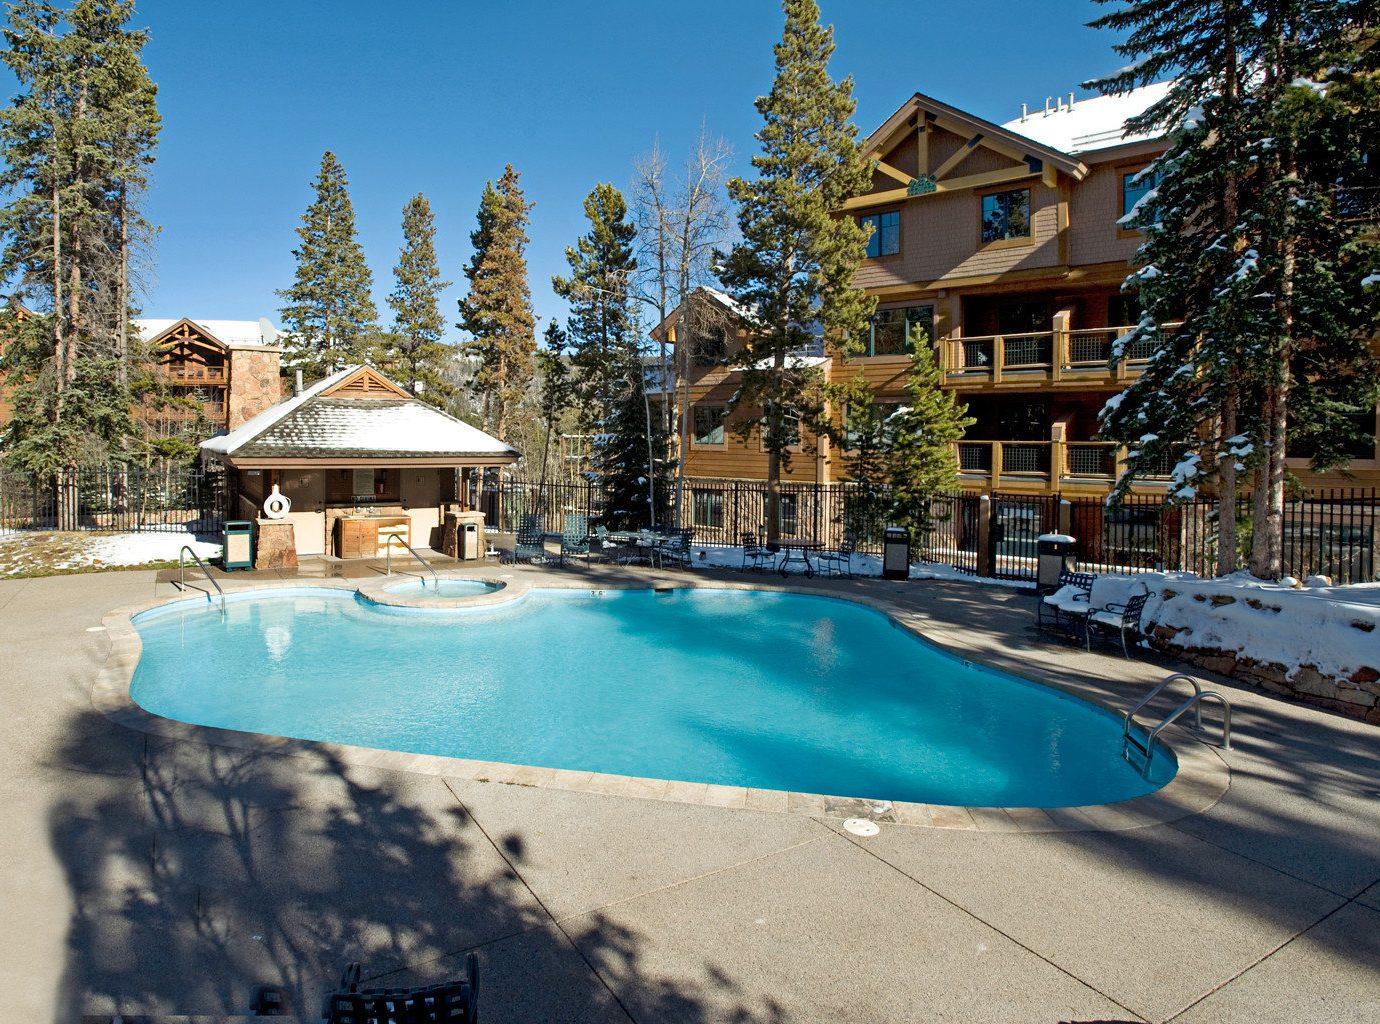 Lodge Patio Pool Rustic tree sky swimming pool leisure property Resort house home backyard Villa blue